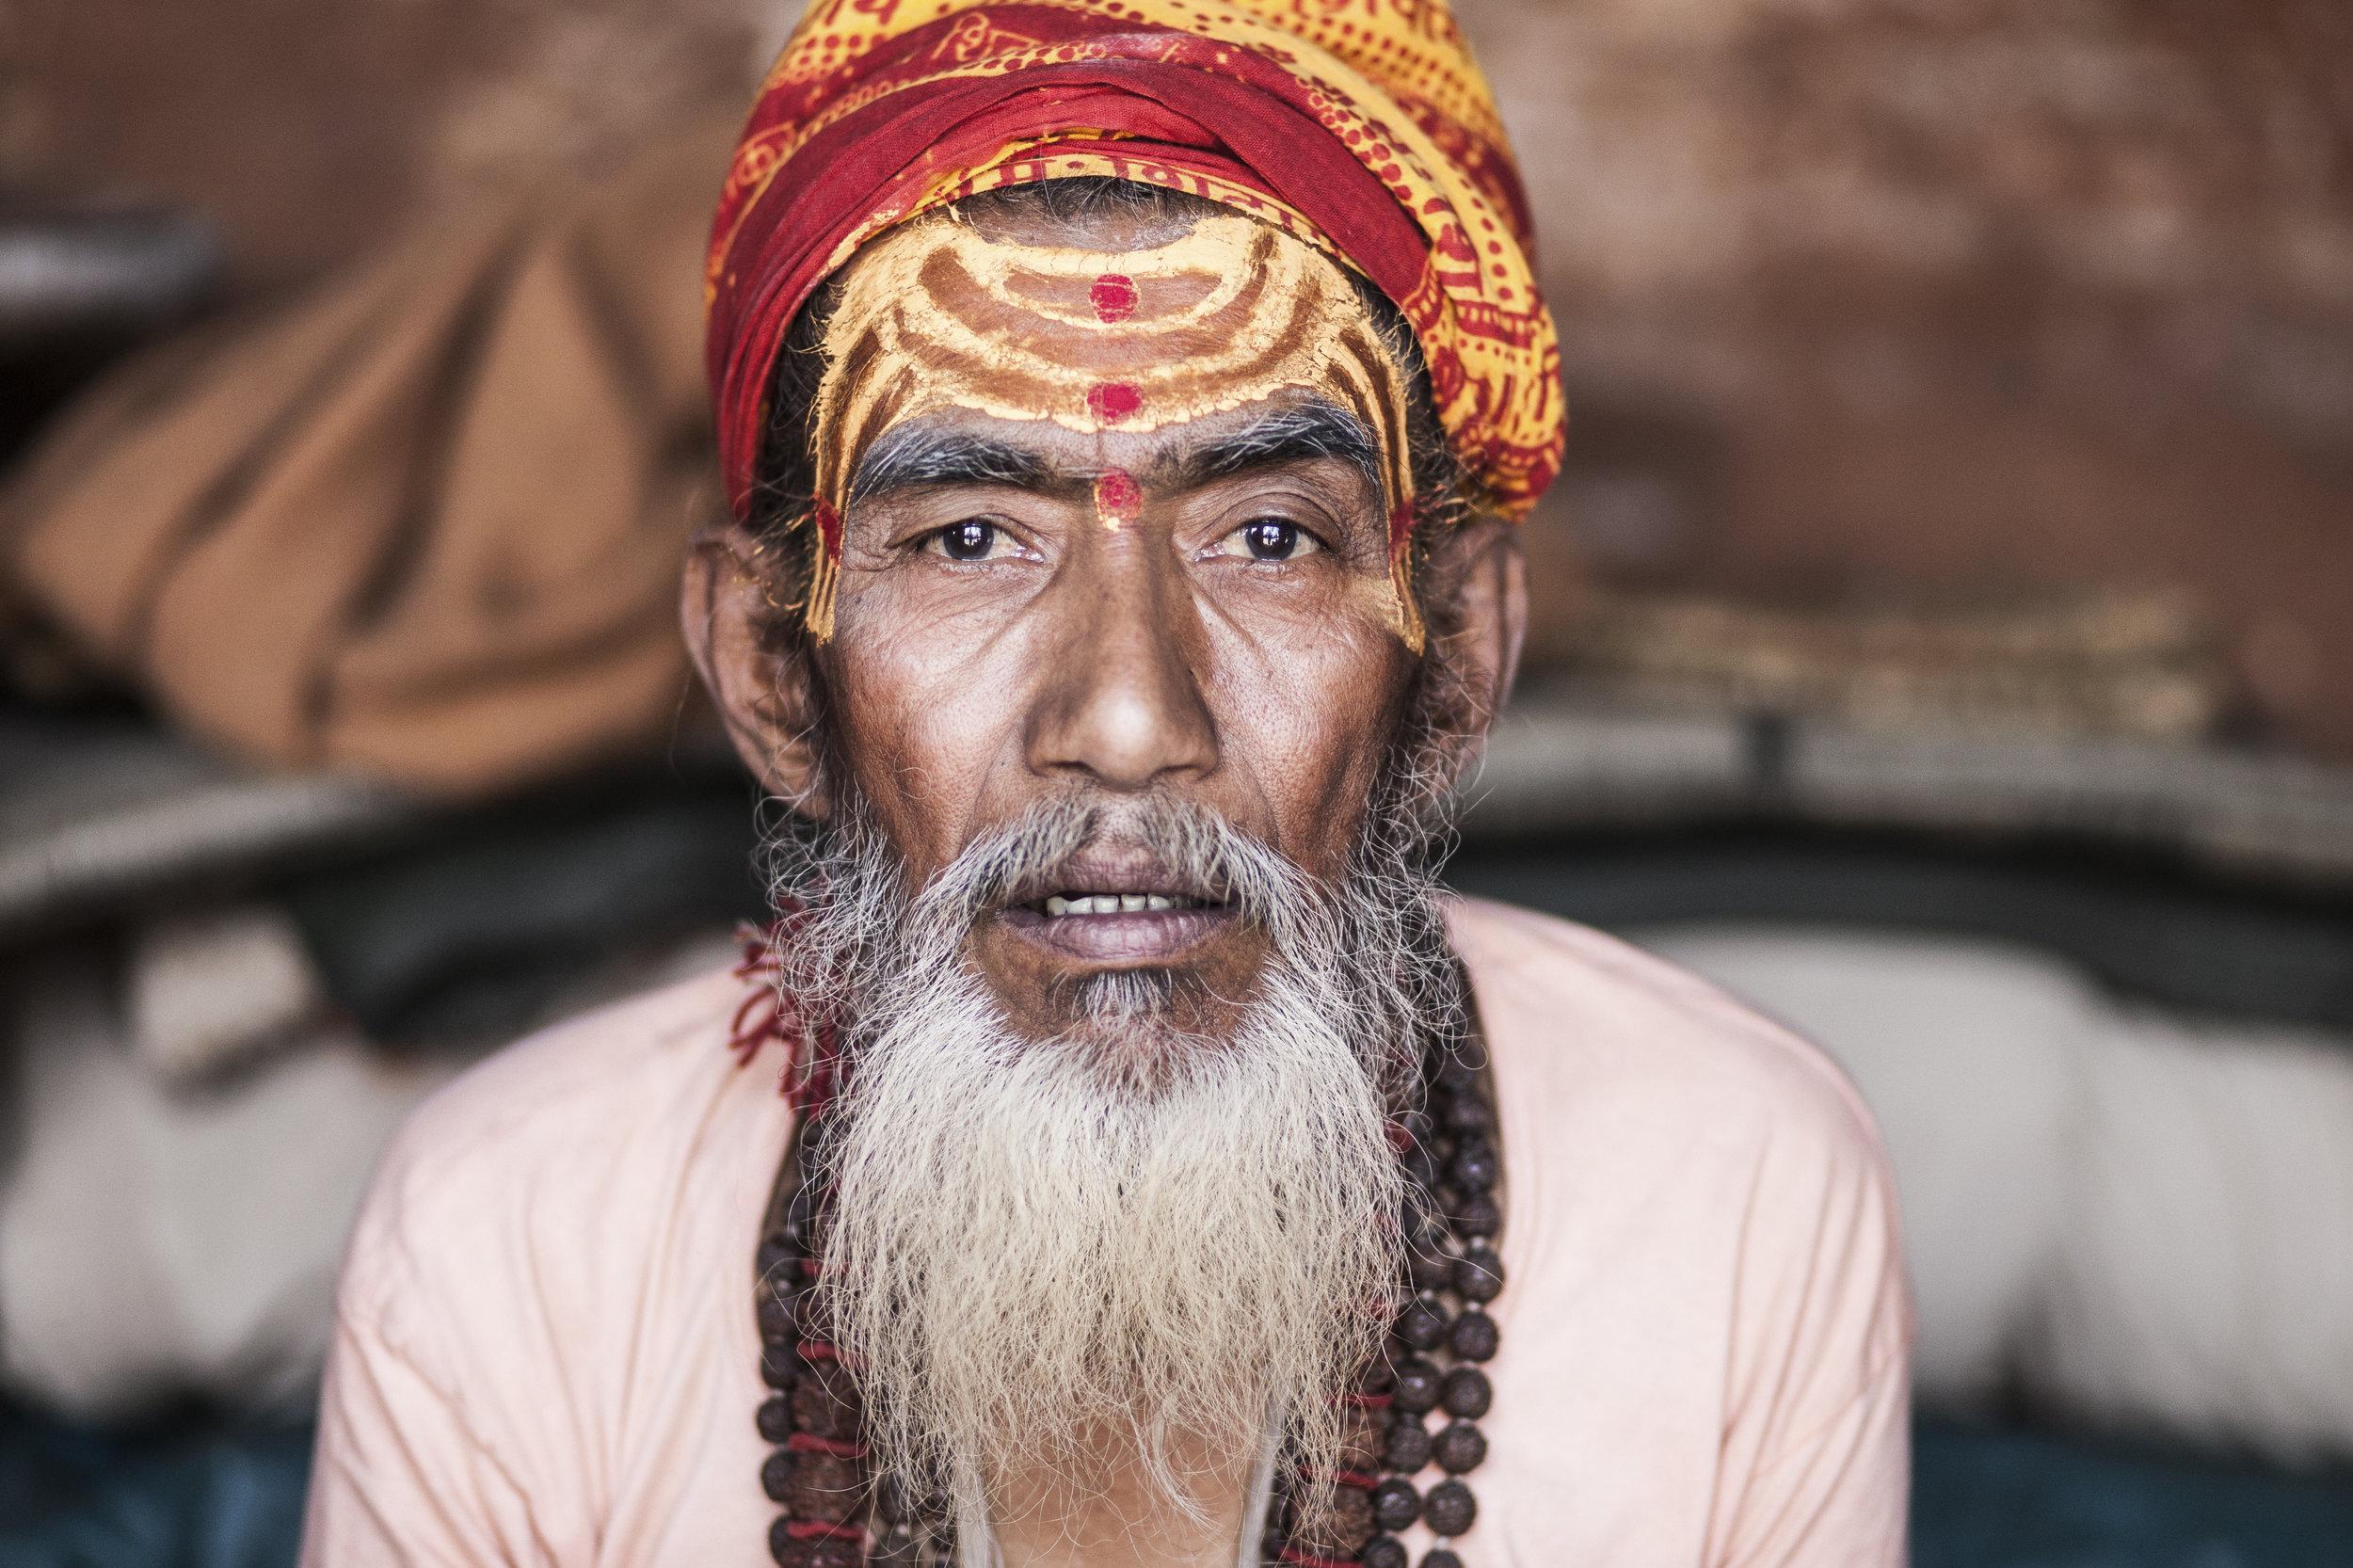 Reportage_Sadhus_Nepal_2012_01.jpg